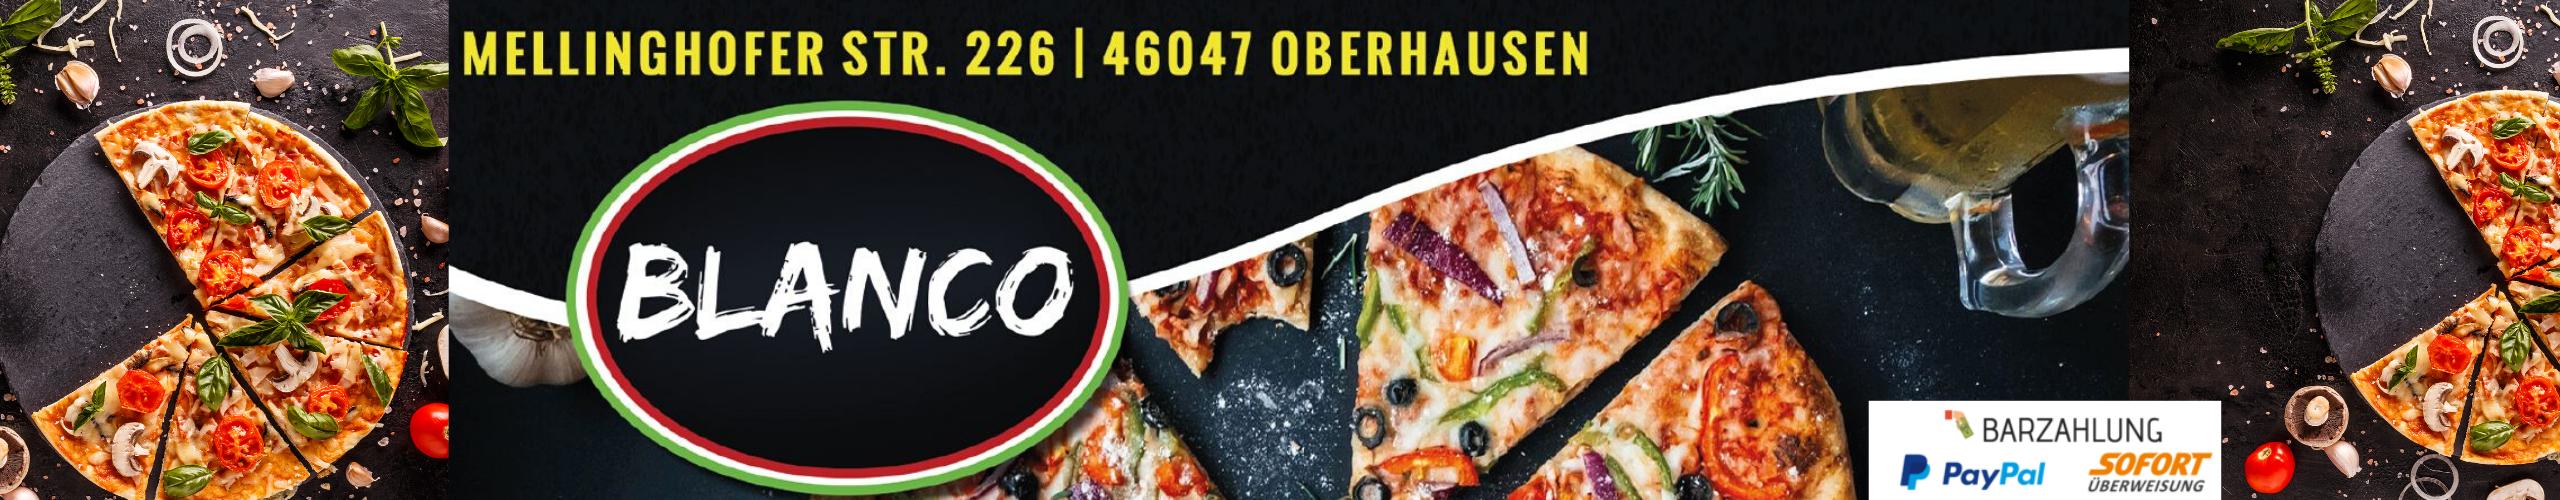 Pizzeria Blanco Oberhausen